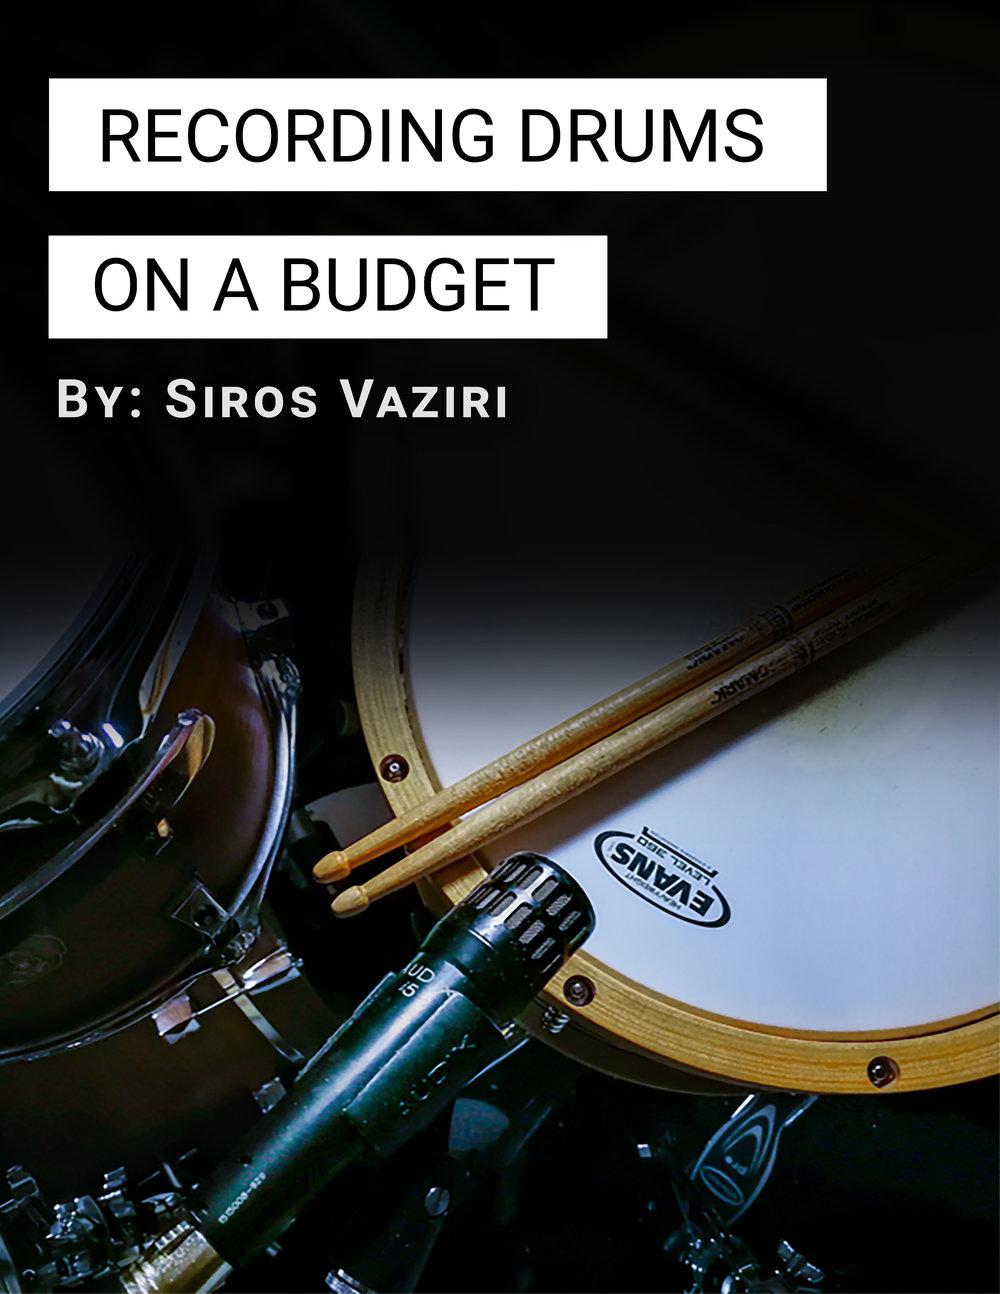 Recording-Drums-on-a-Budget_v2.jpg